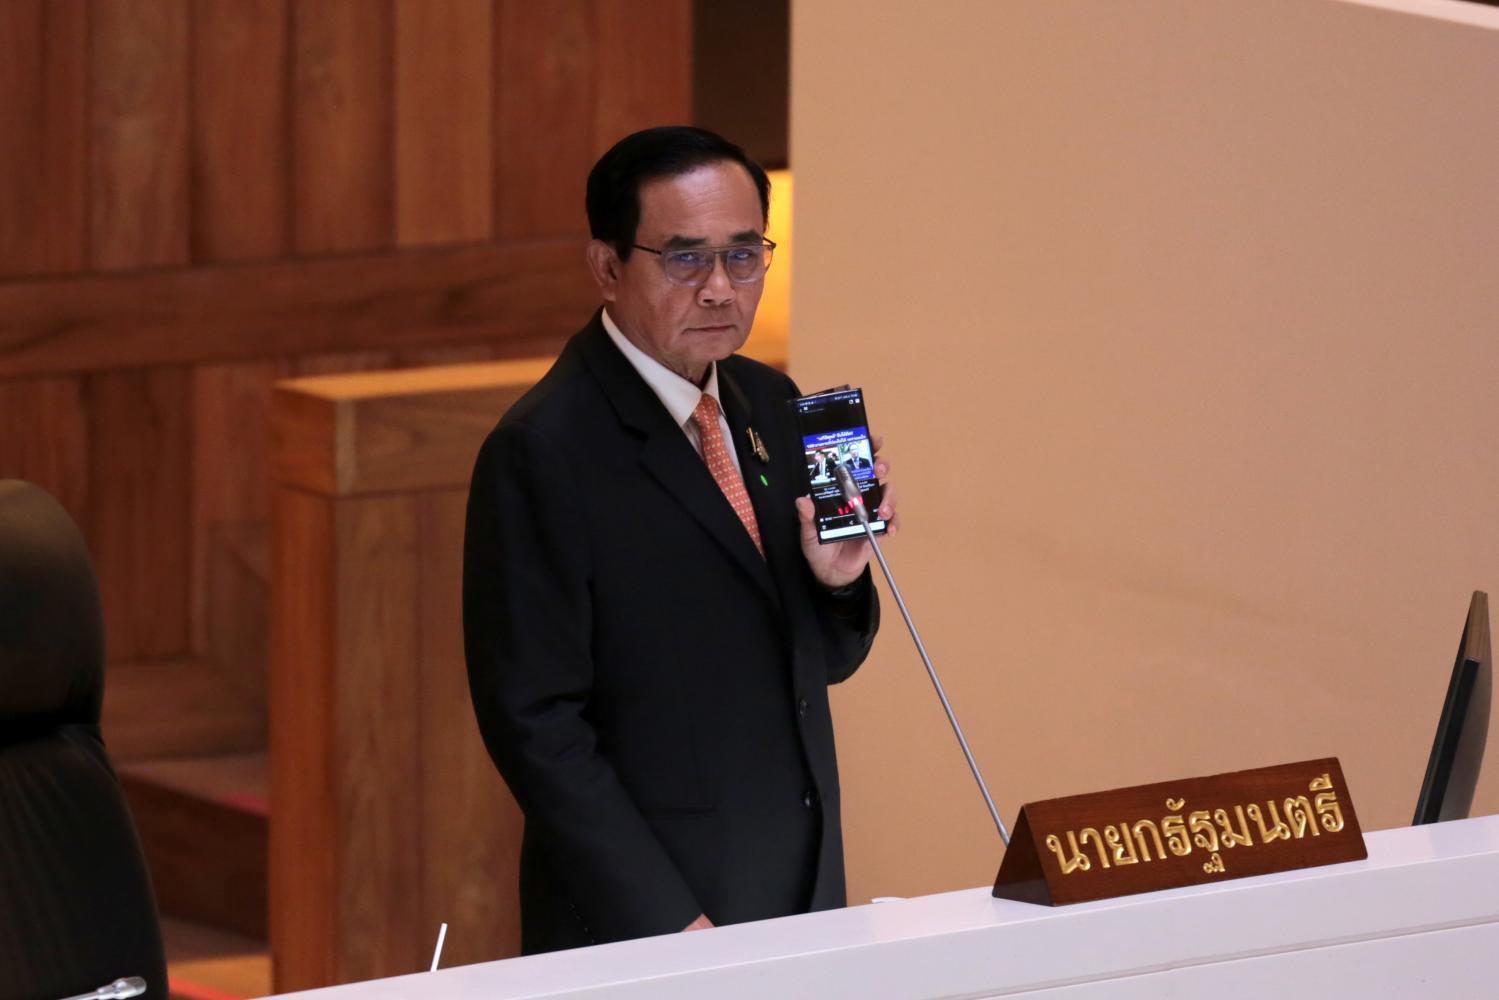 Prime Minister Prayut Chan-o-cha plays a video clip on his phone to counter a claim made against him by Pol Gen Sereepisuth Temeeyaves, leader of Seri Ruam Thai Party.(Photos by Chanat Katanyu)